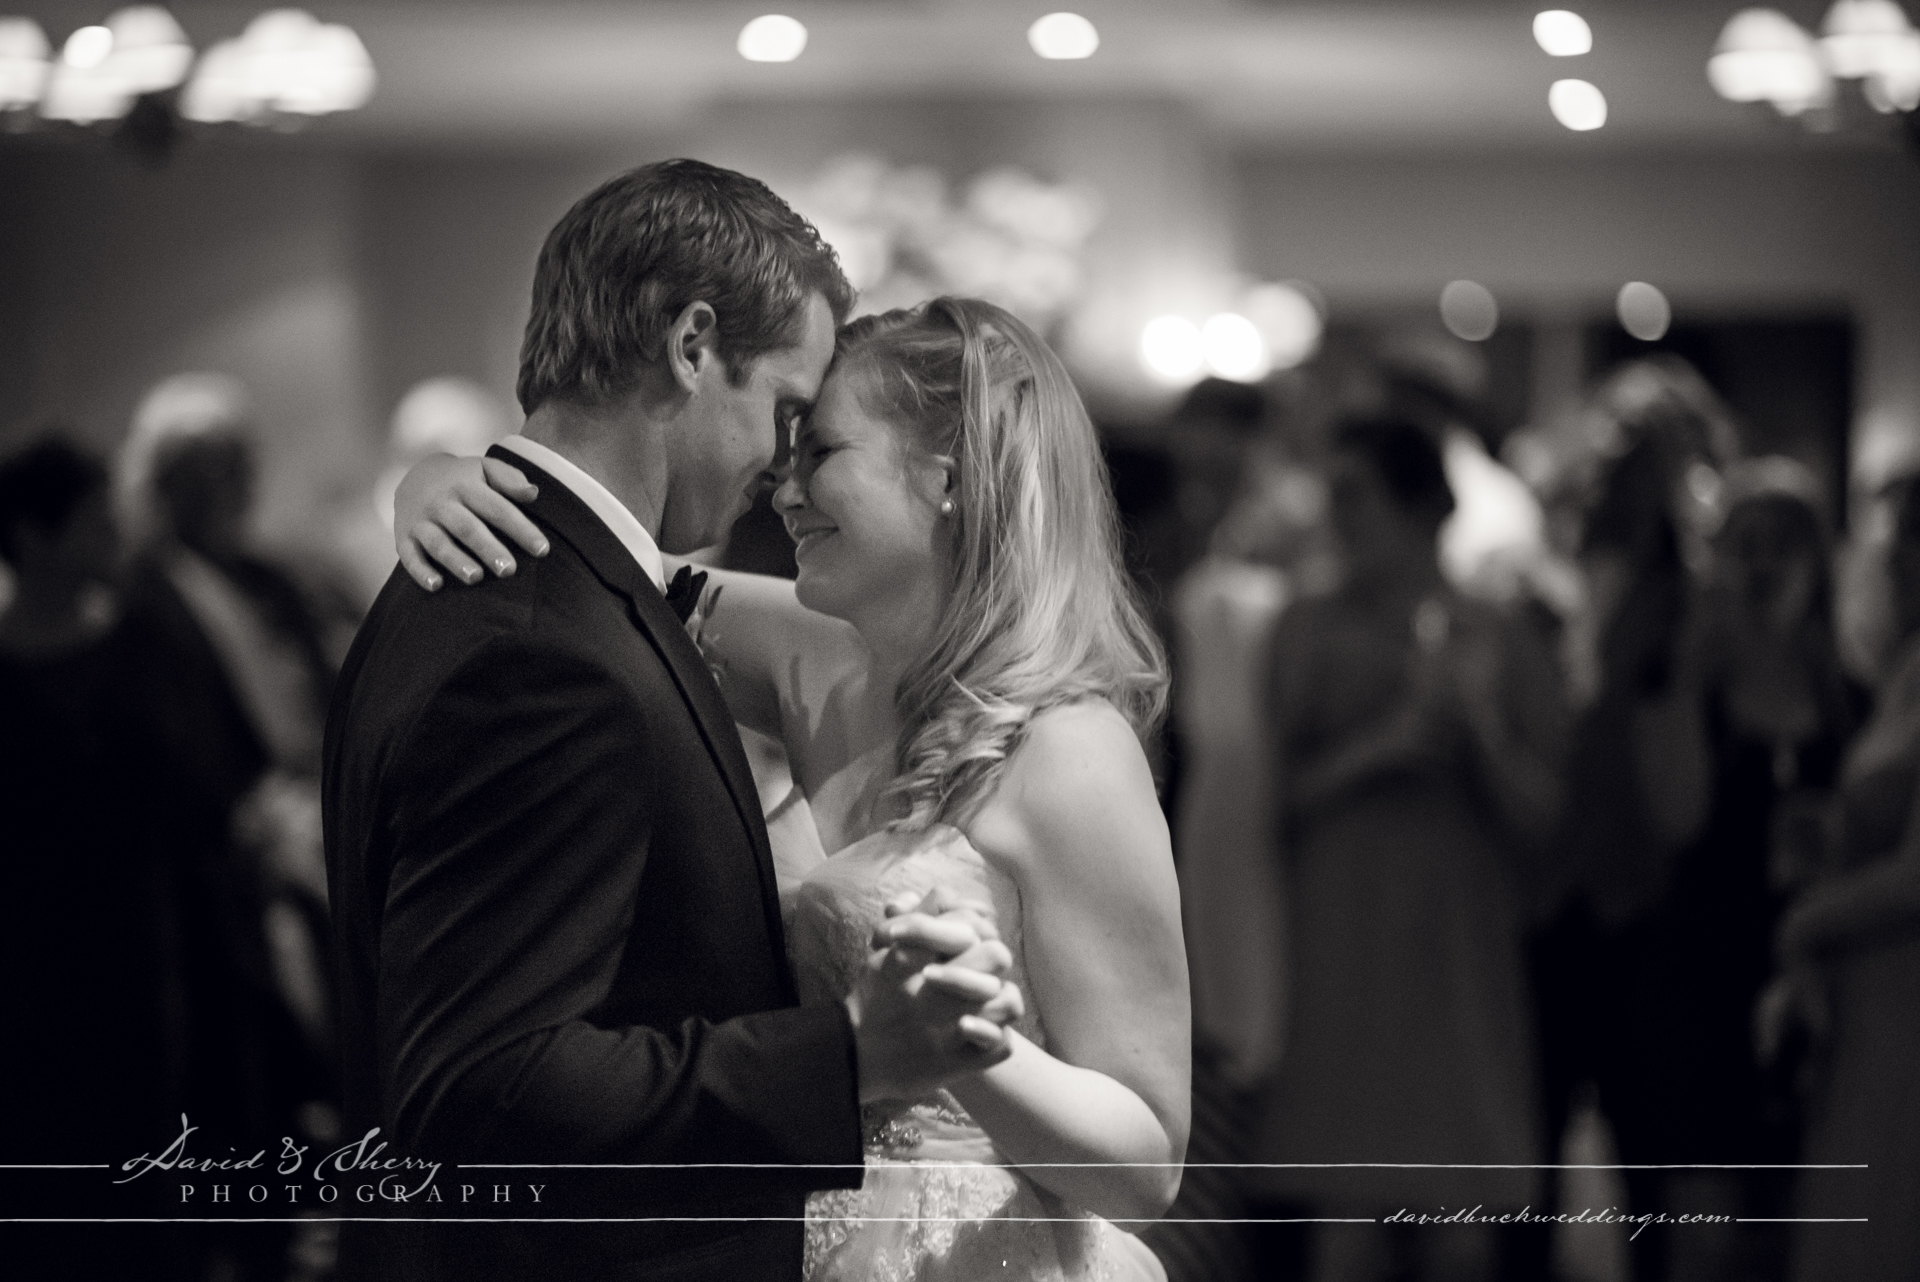 Cobble_Beach_Wedding_Photography_33